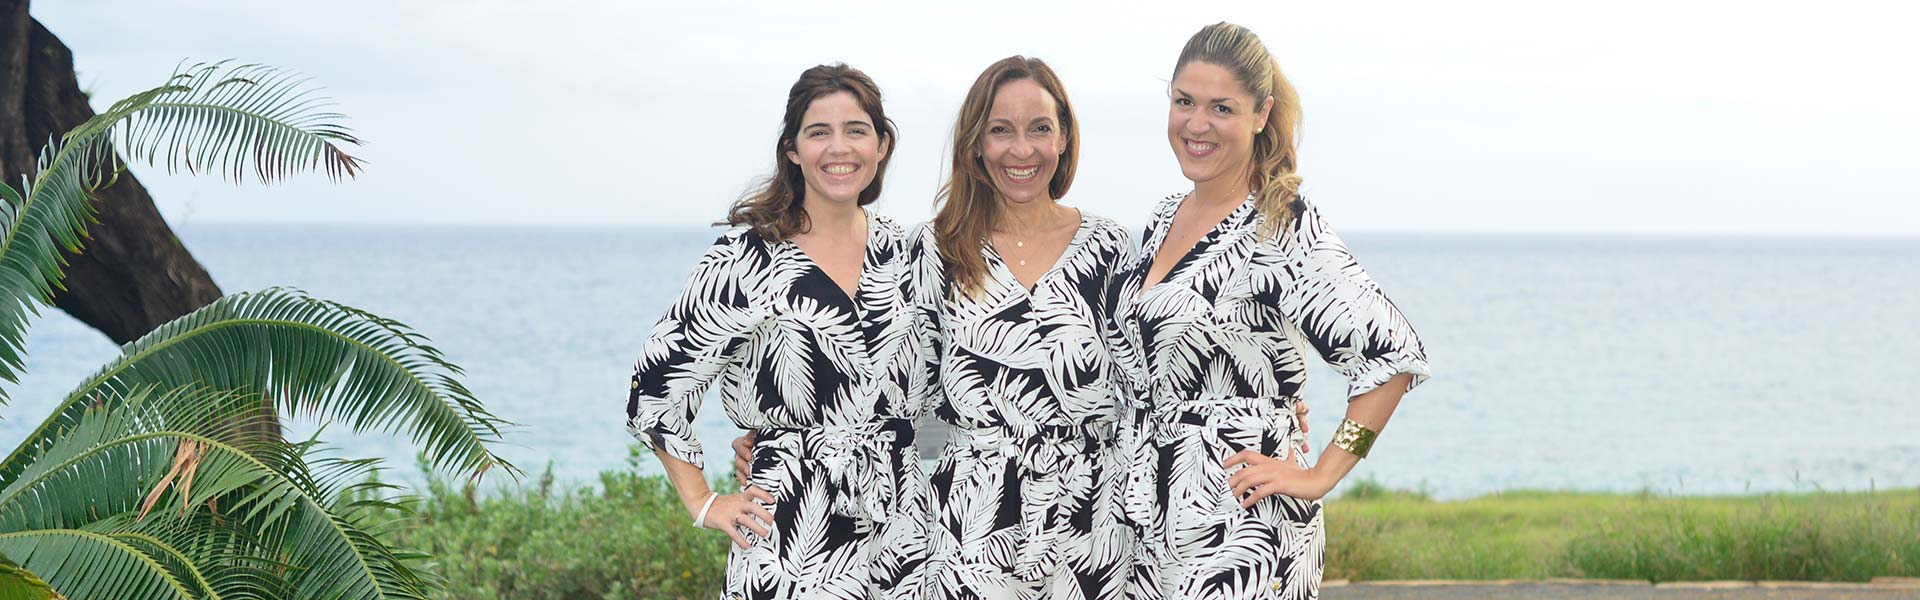 three ladies with plam threes